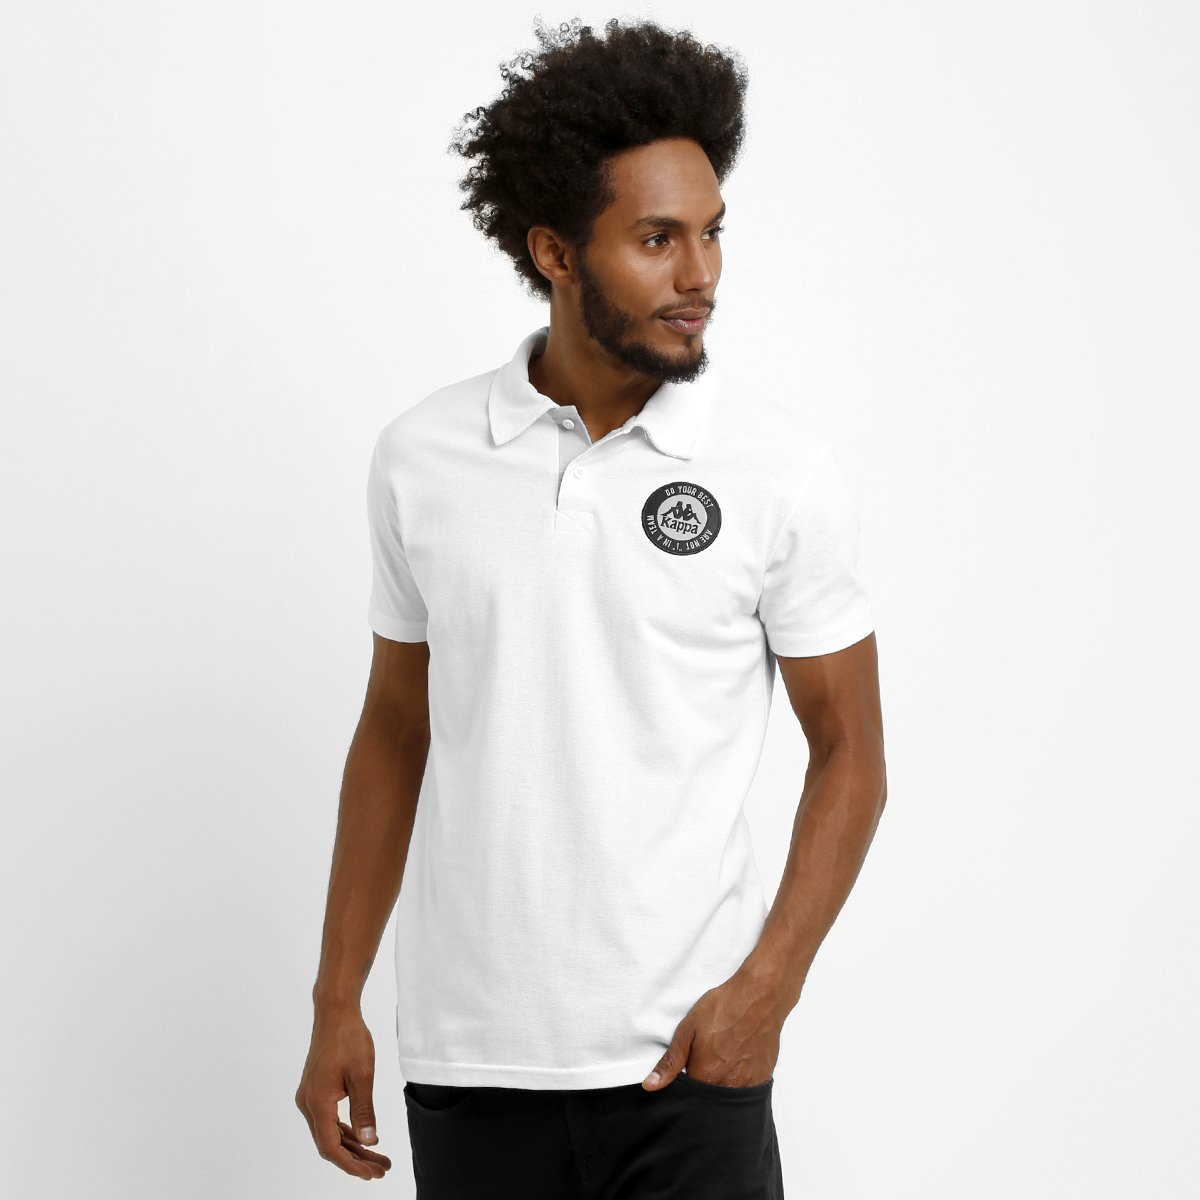 Camisa Polo Kappa Stamp c87d76463a27e